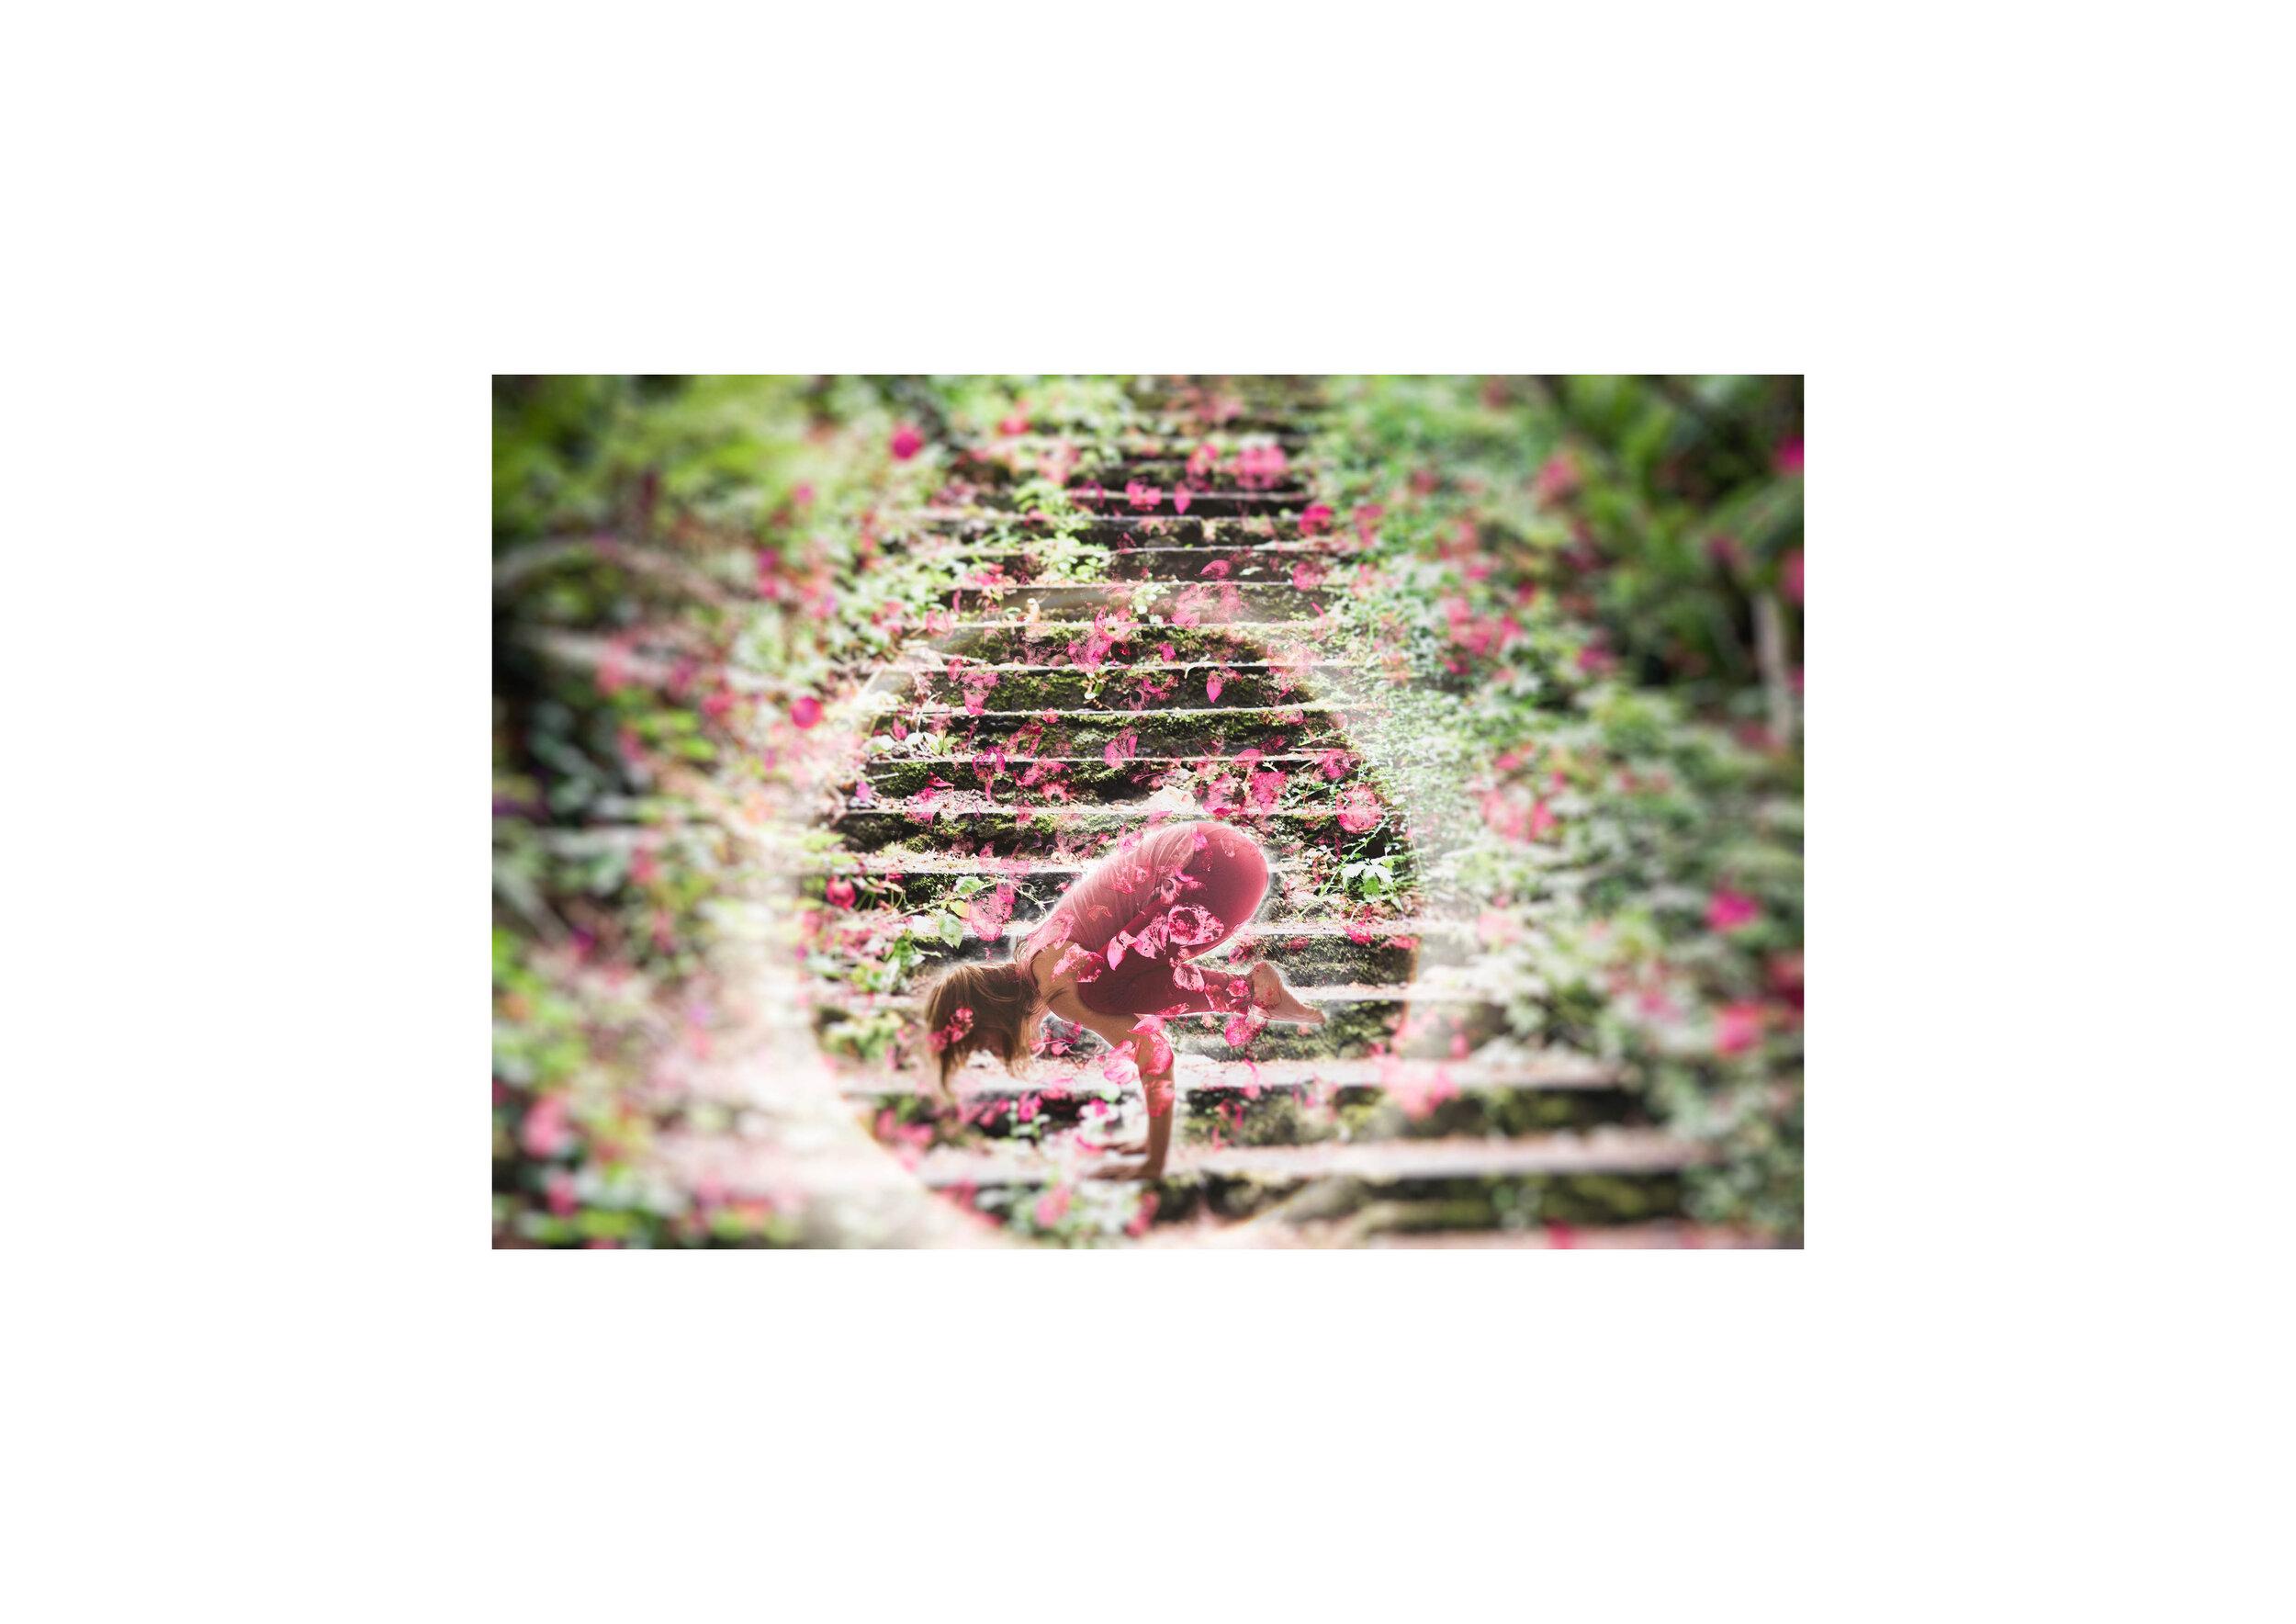 Bakasana on steps